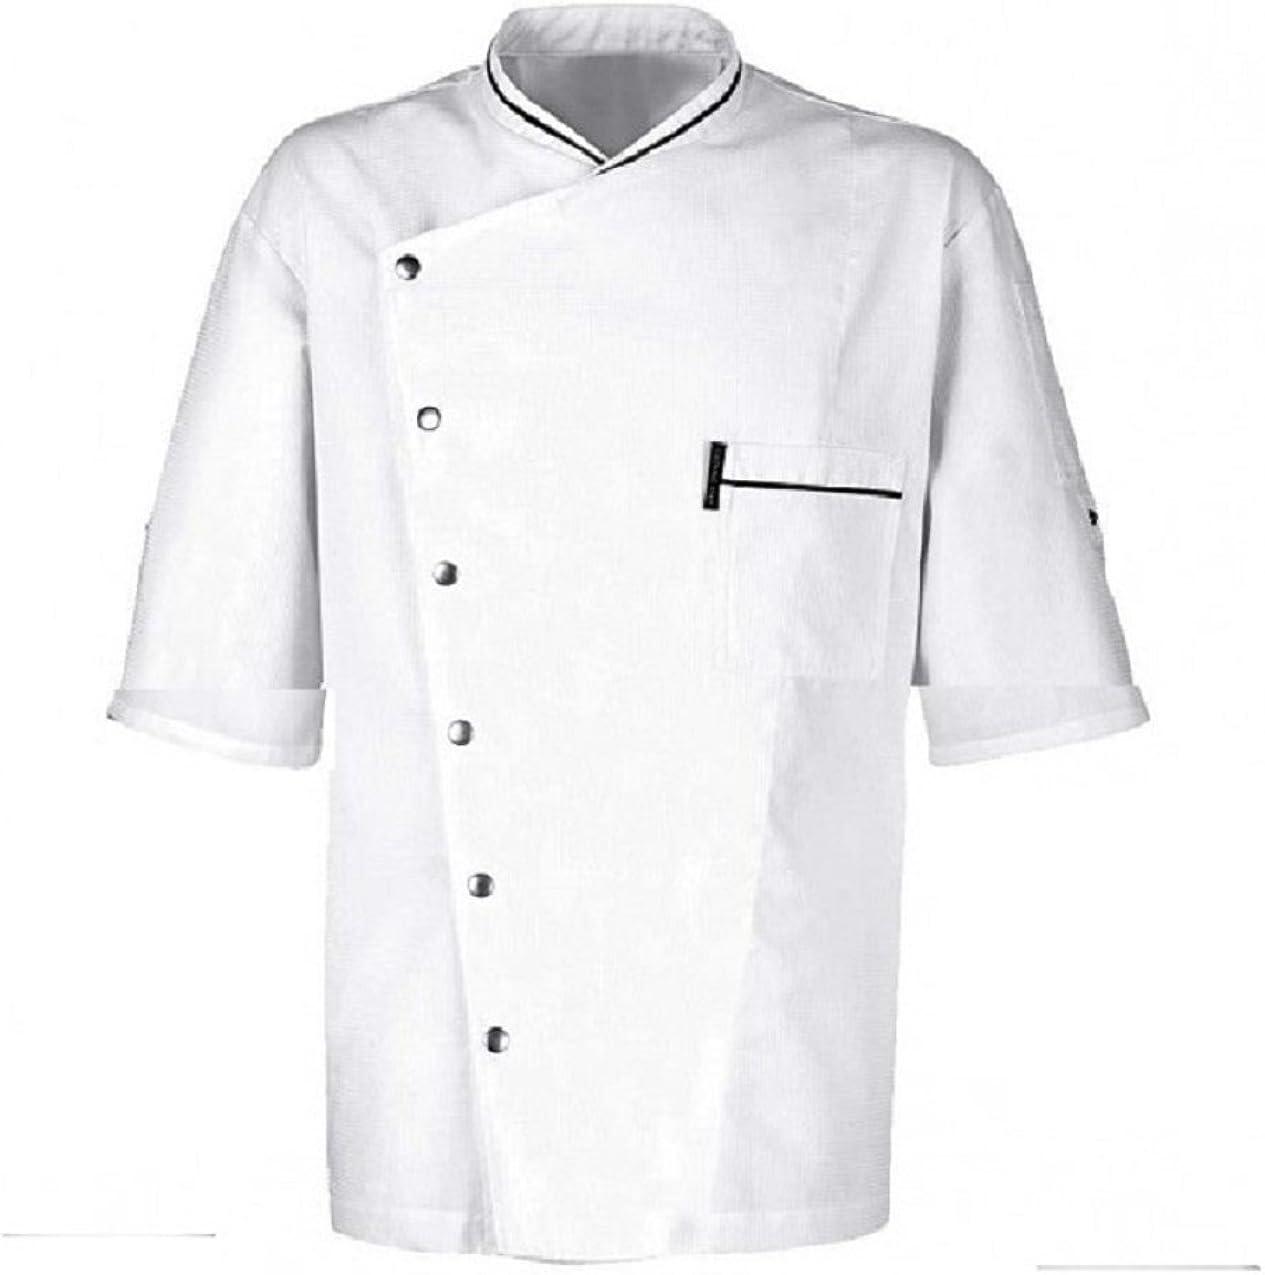 Unisex Men latest Women Chef Jacket White Black Coats Cook coll shopping Clothes